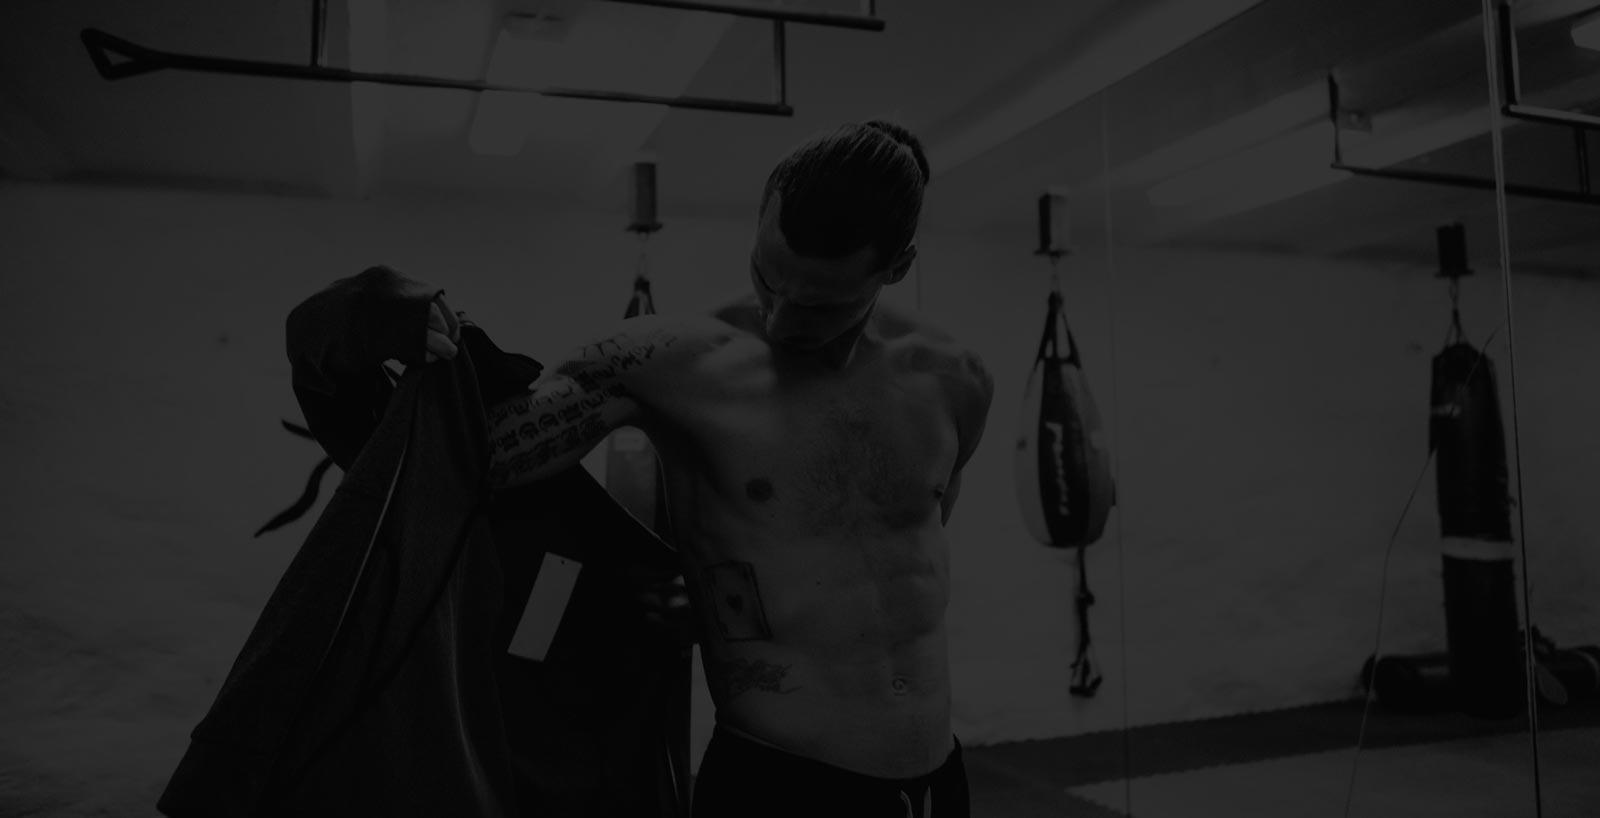 Ibrahimovic va bientôt lancer sa marque de vêtements de sport